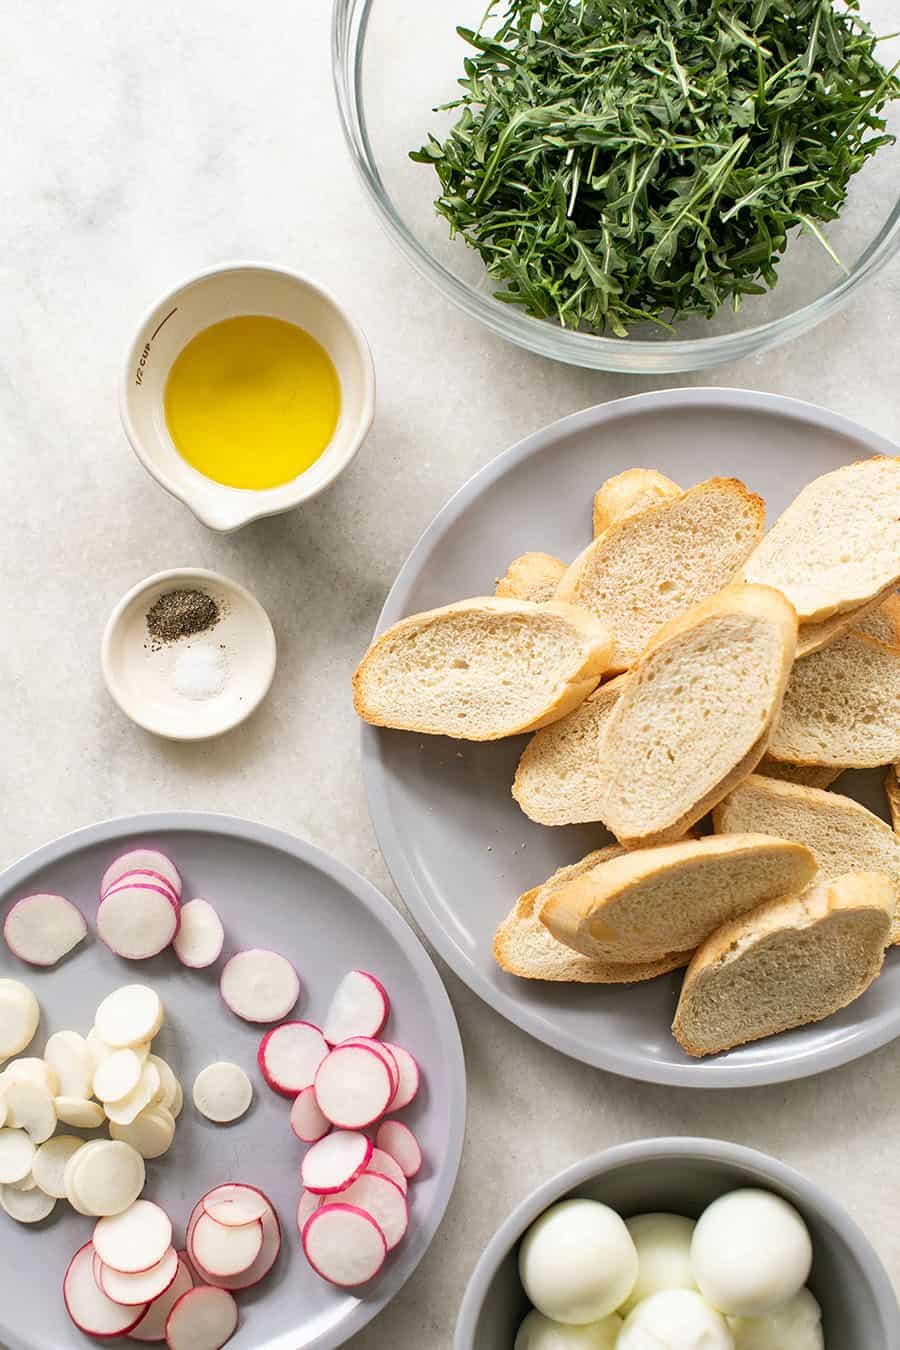 Ingredients to make a crostini recipe.